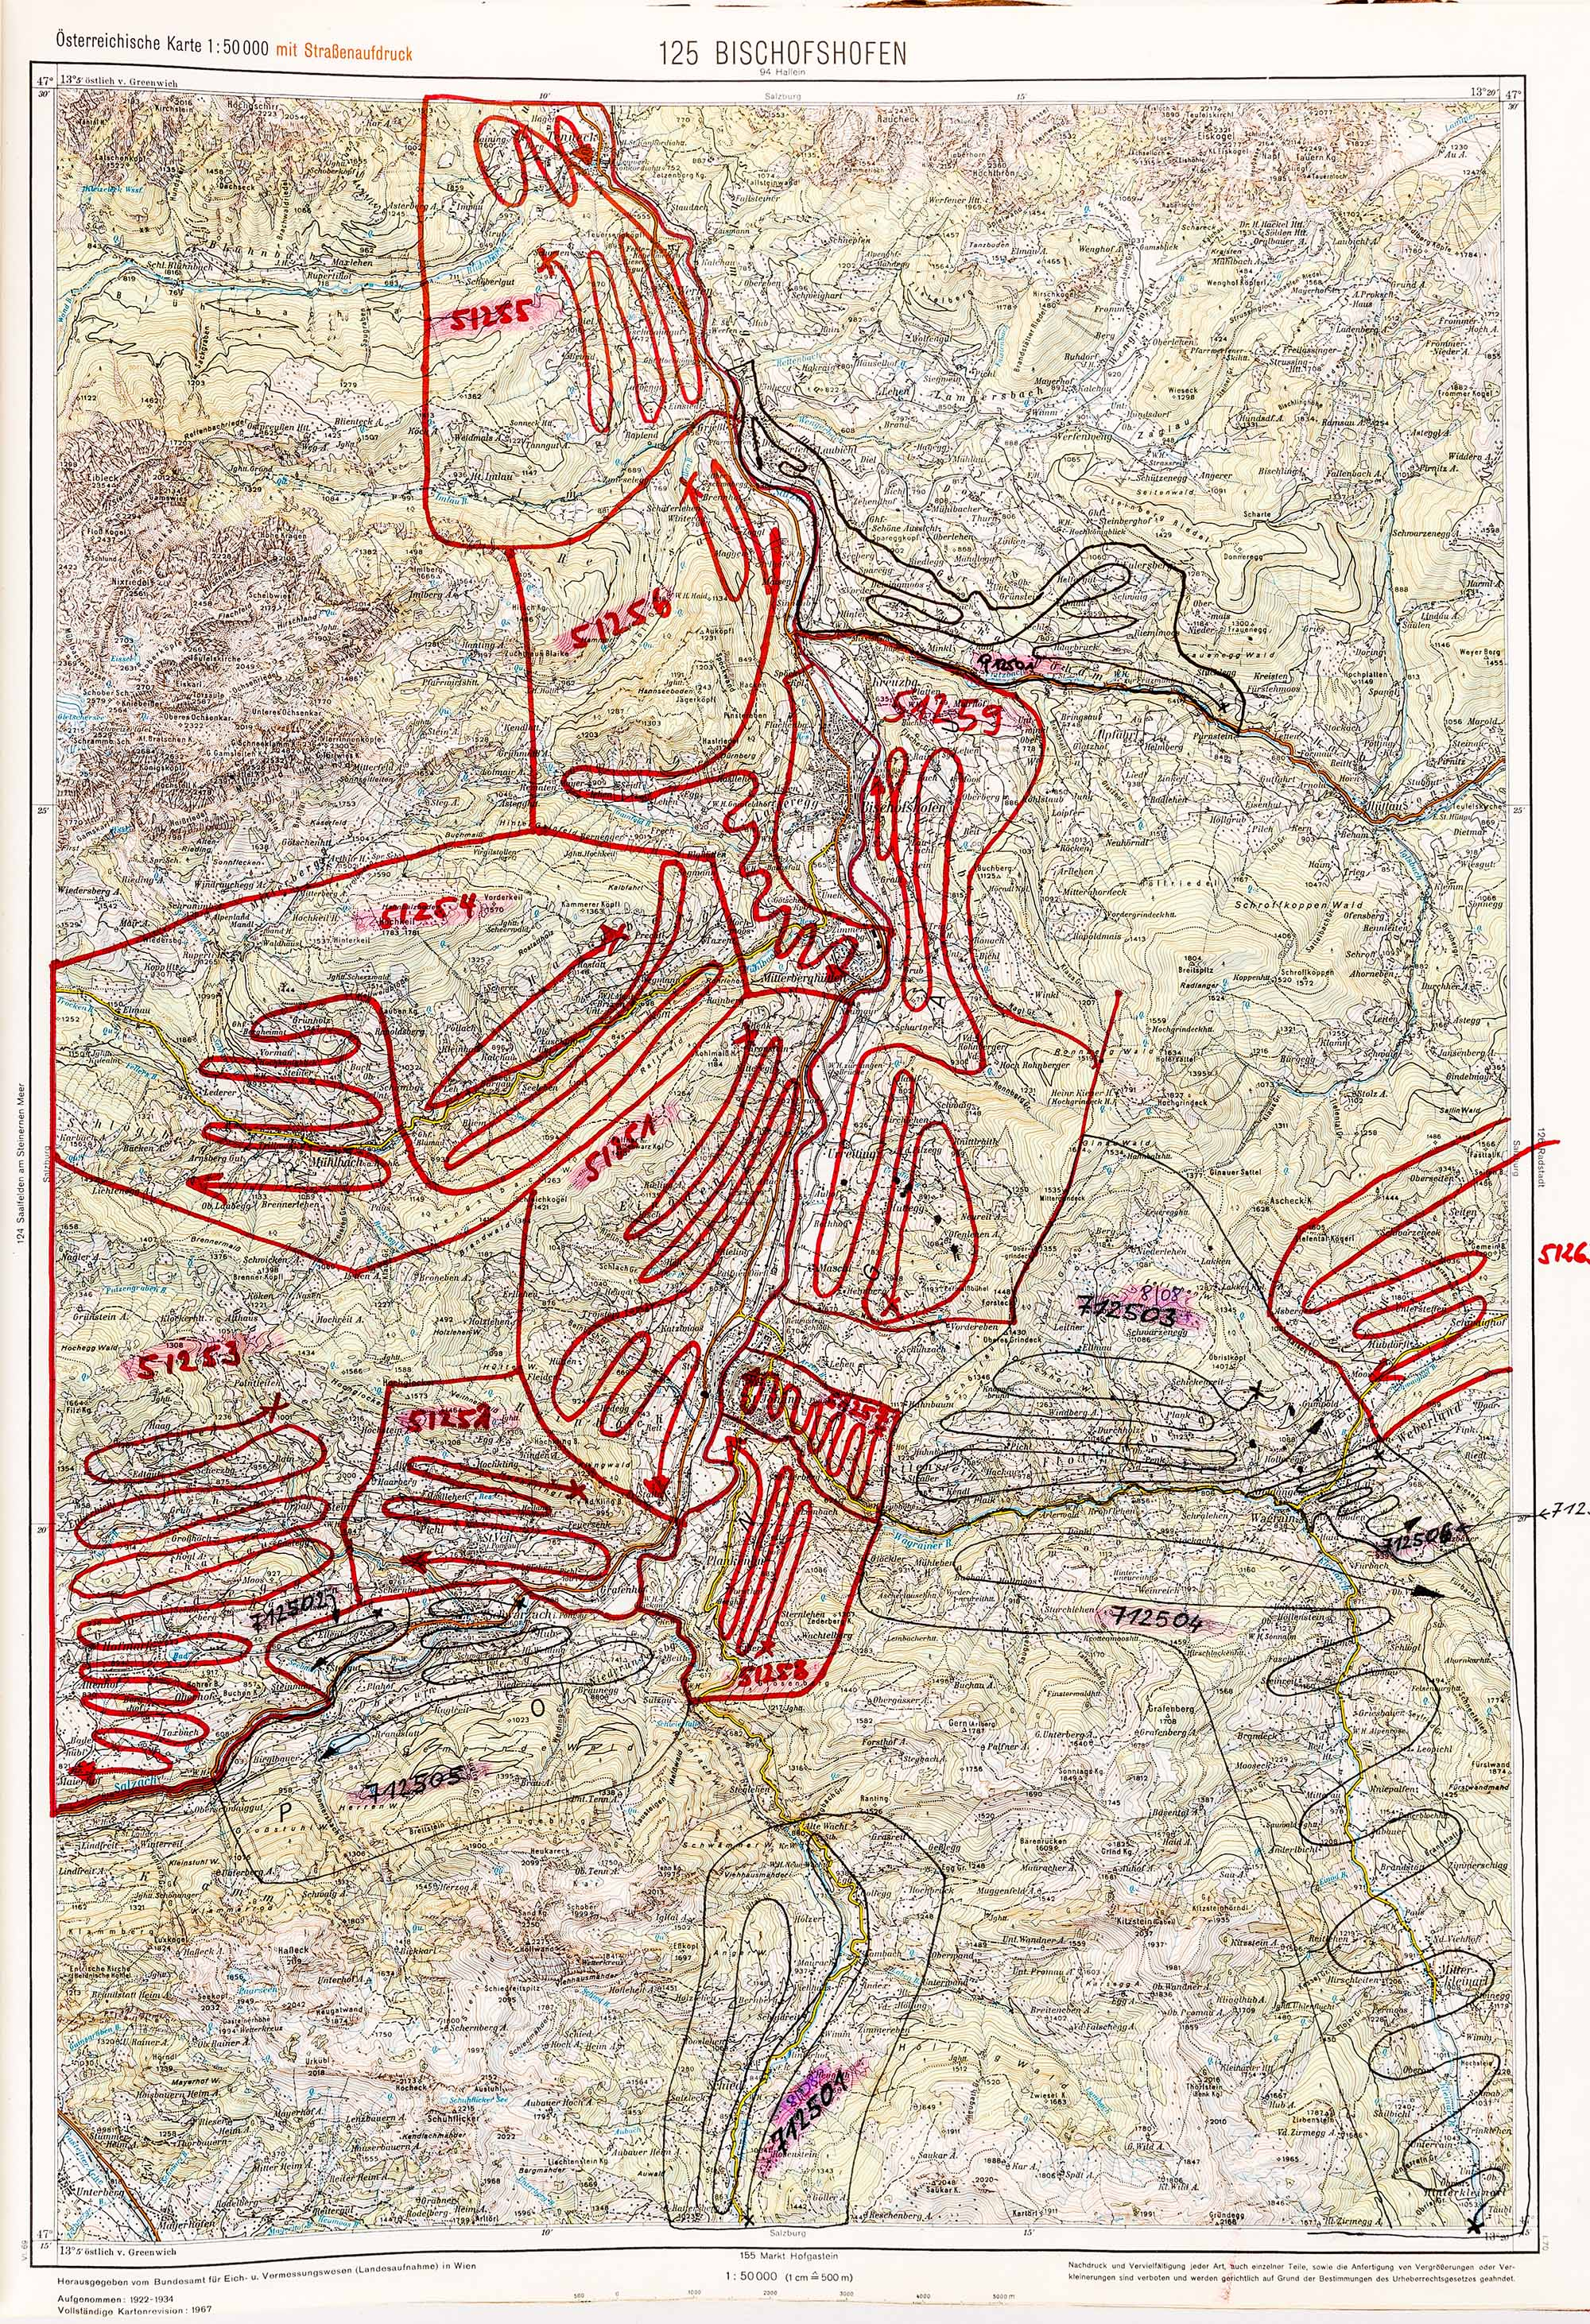 1975-1979 Karte 125